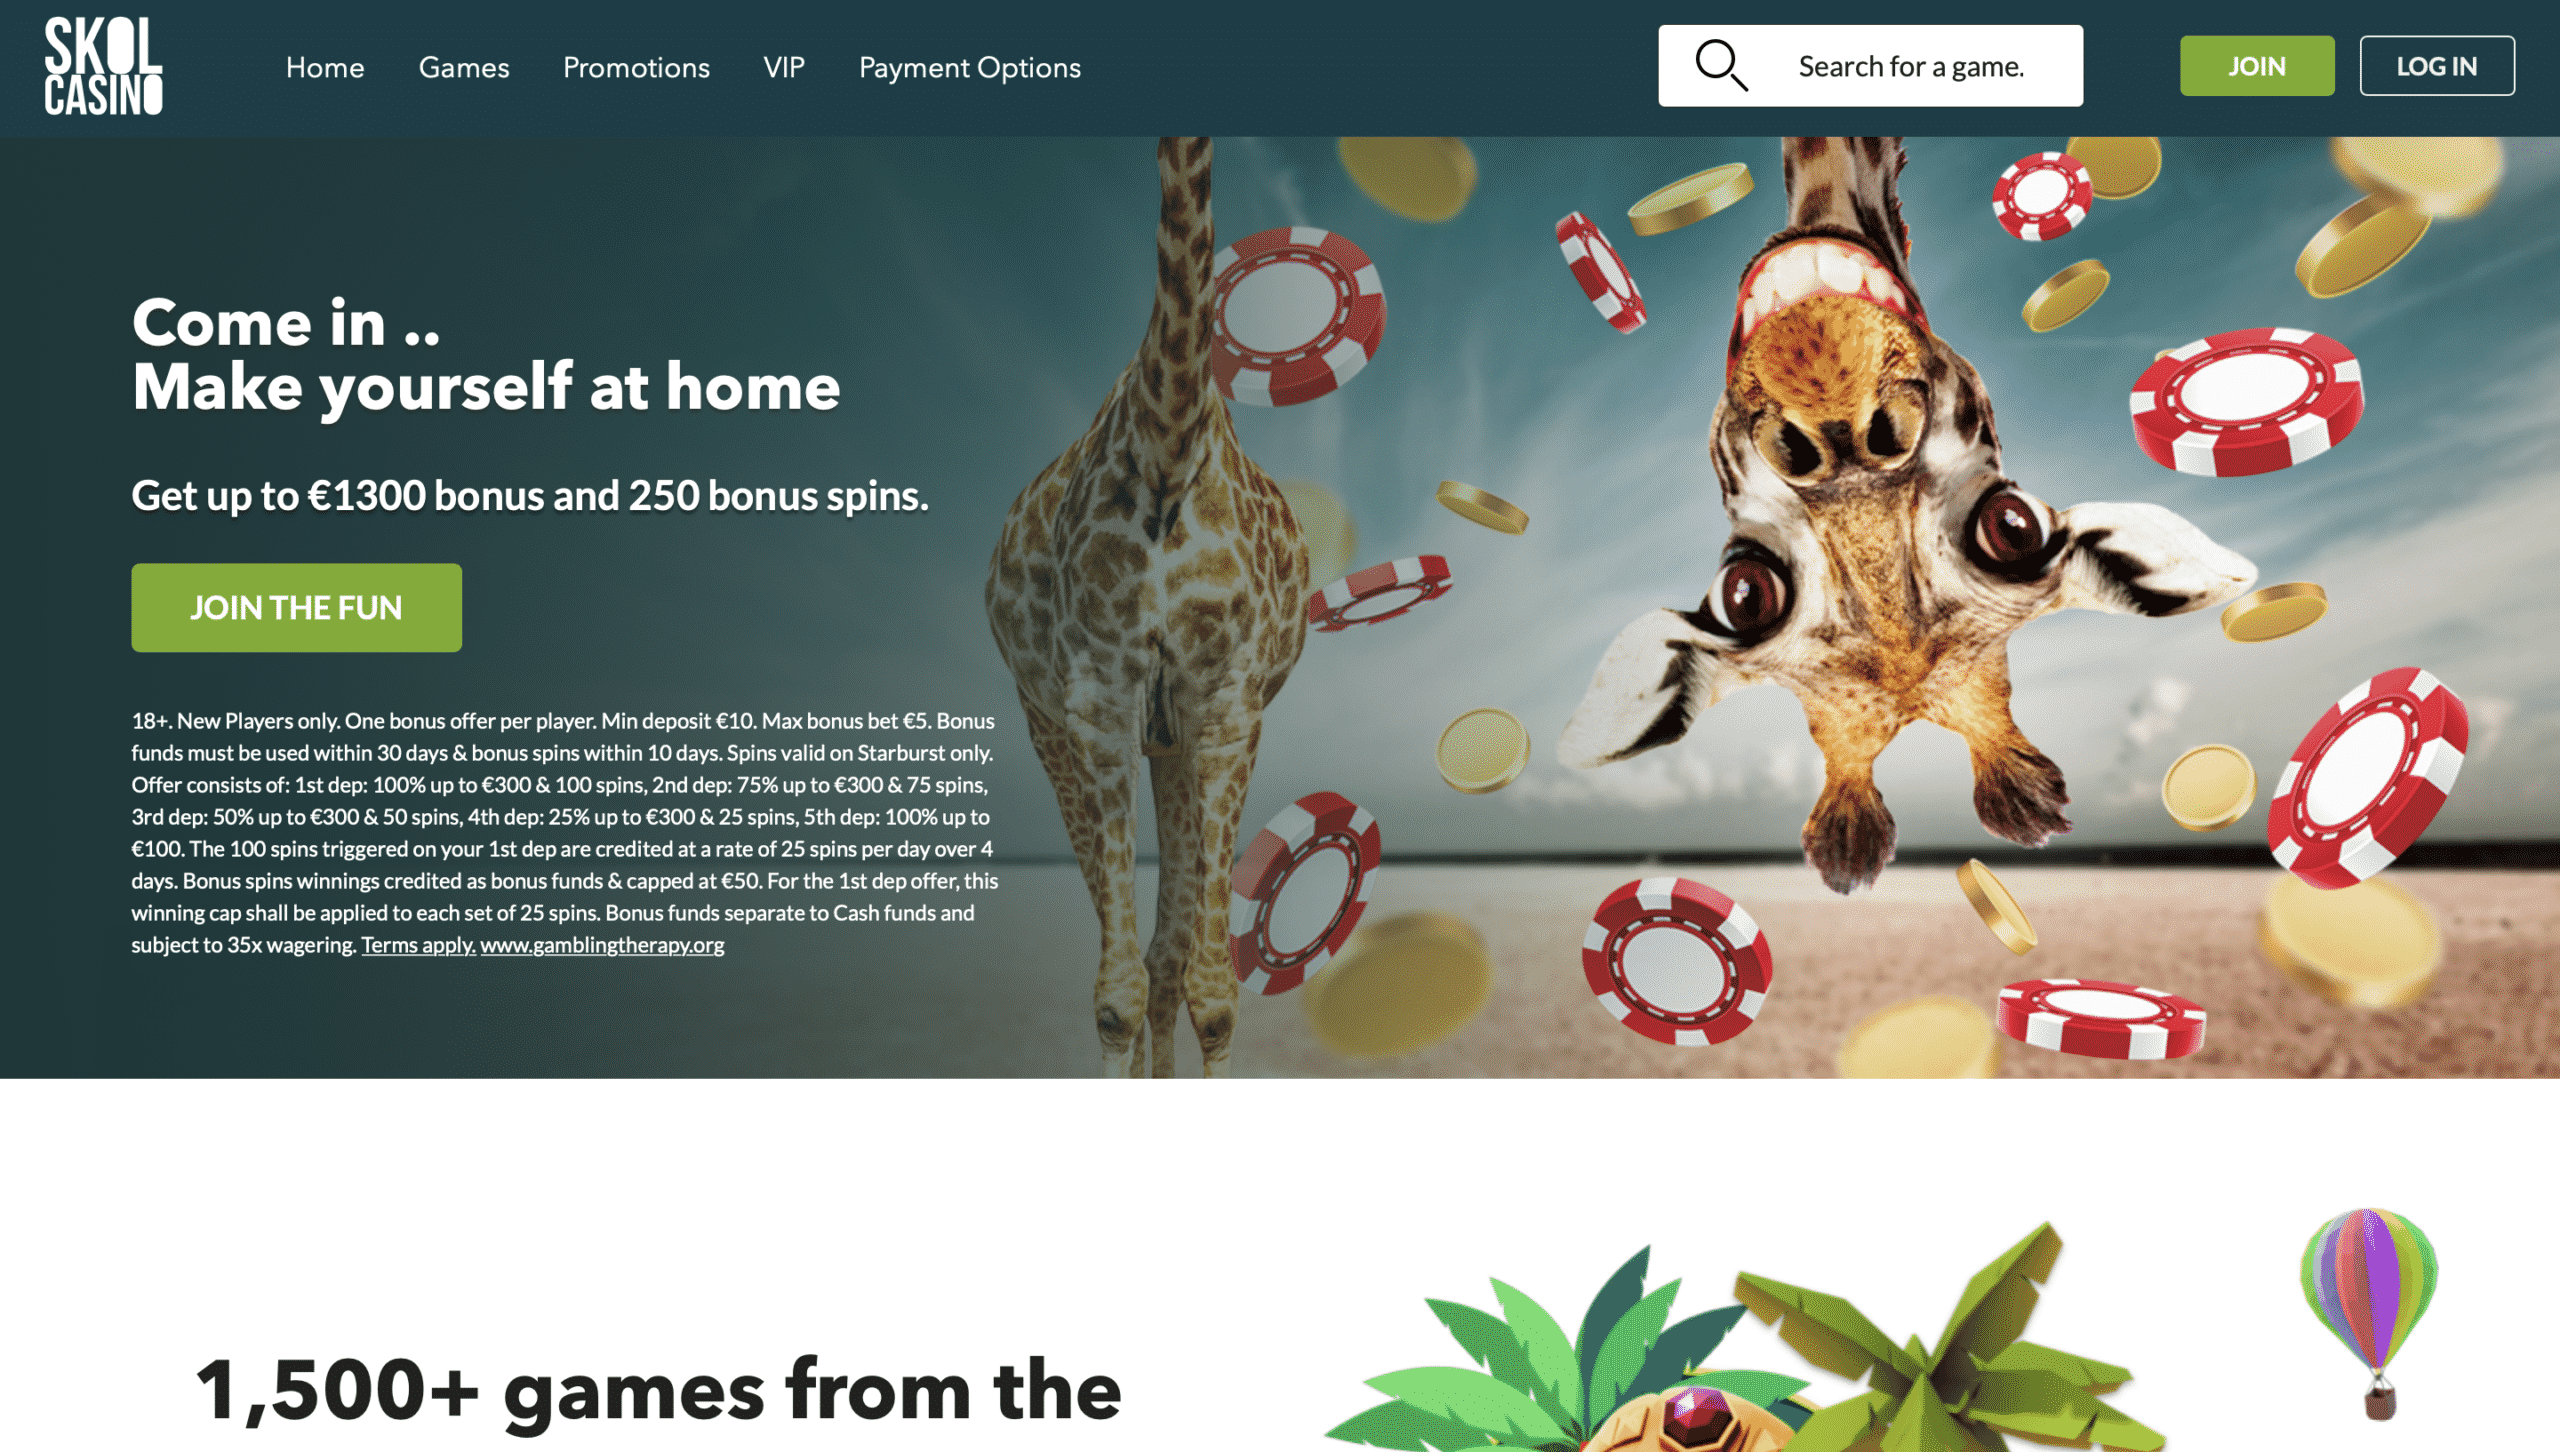 Skol Casino Homepage